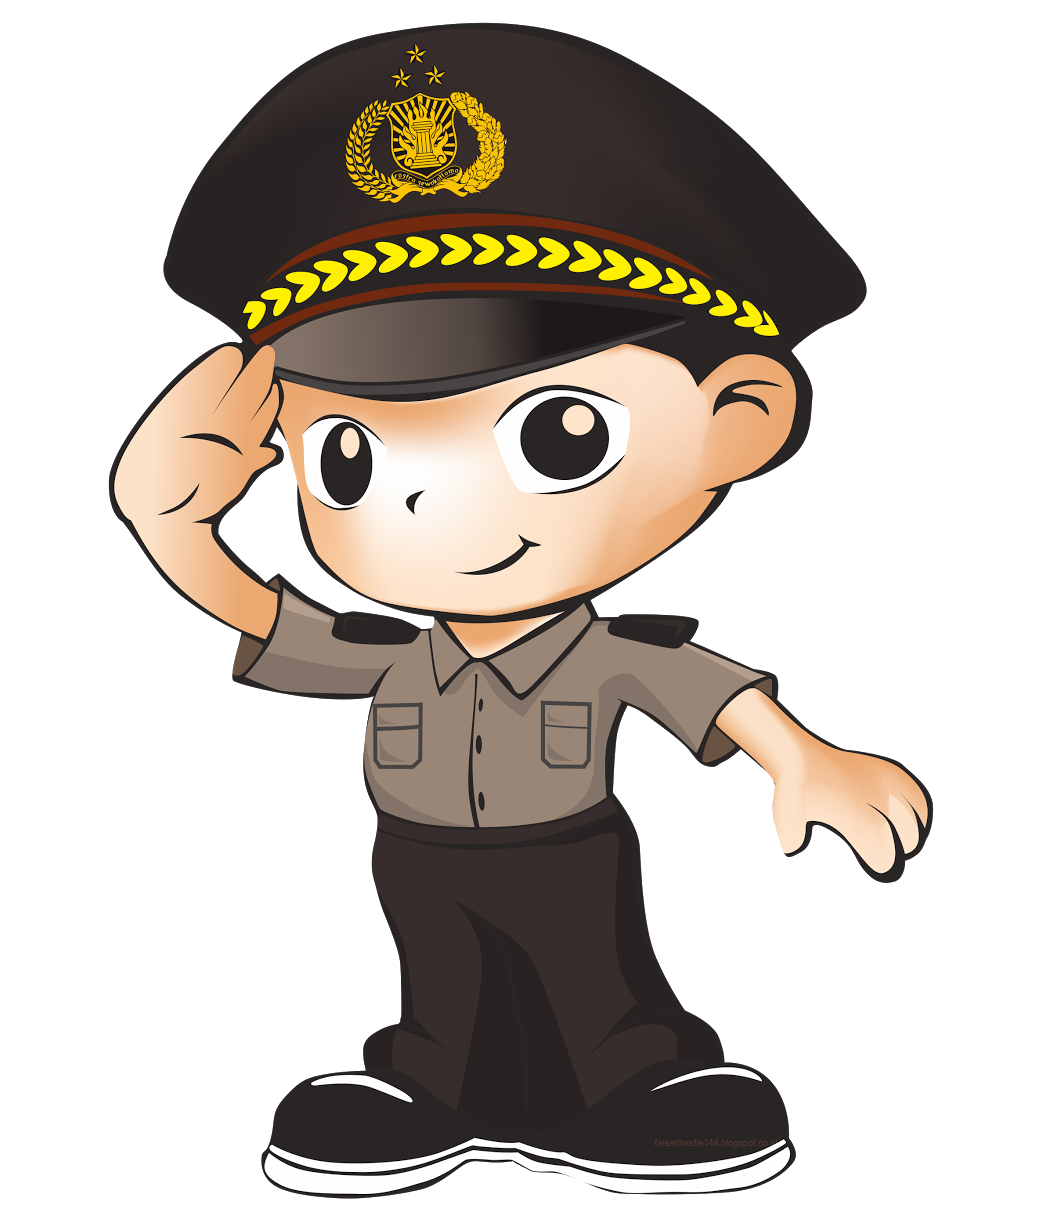 Lady clipart security guard. Logo maskot promoter polri